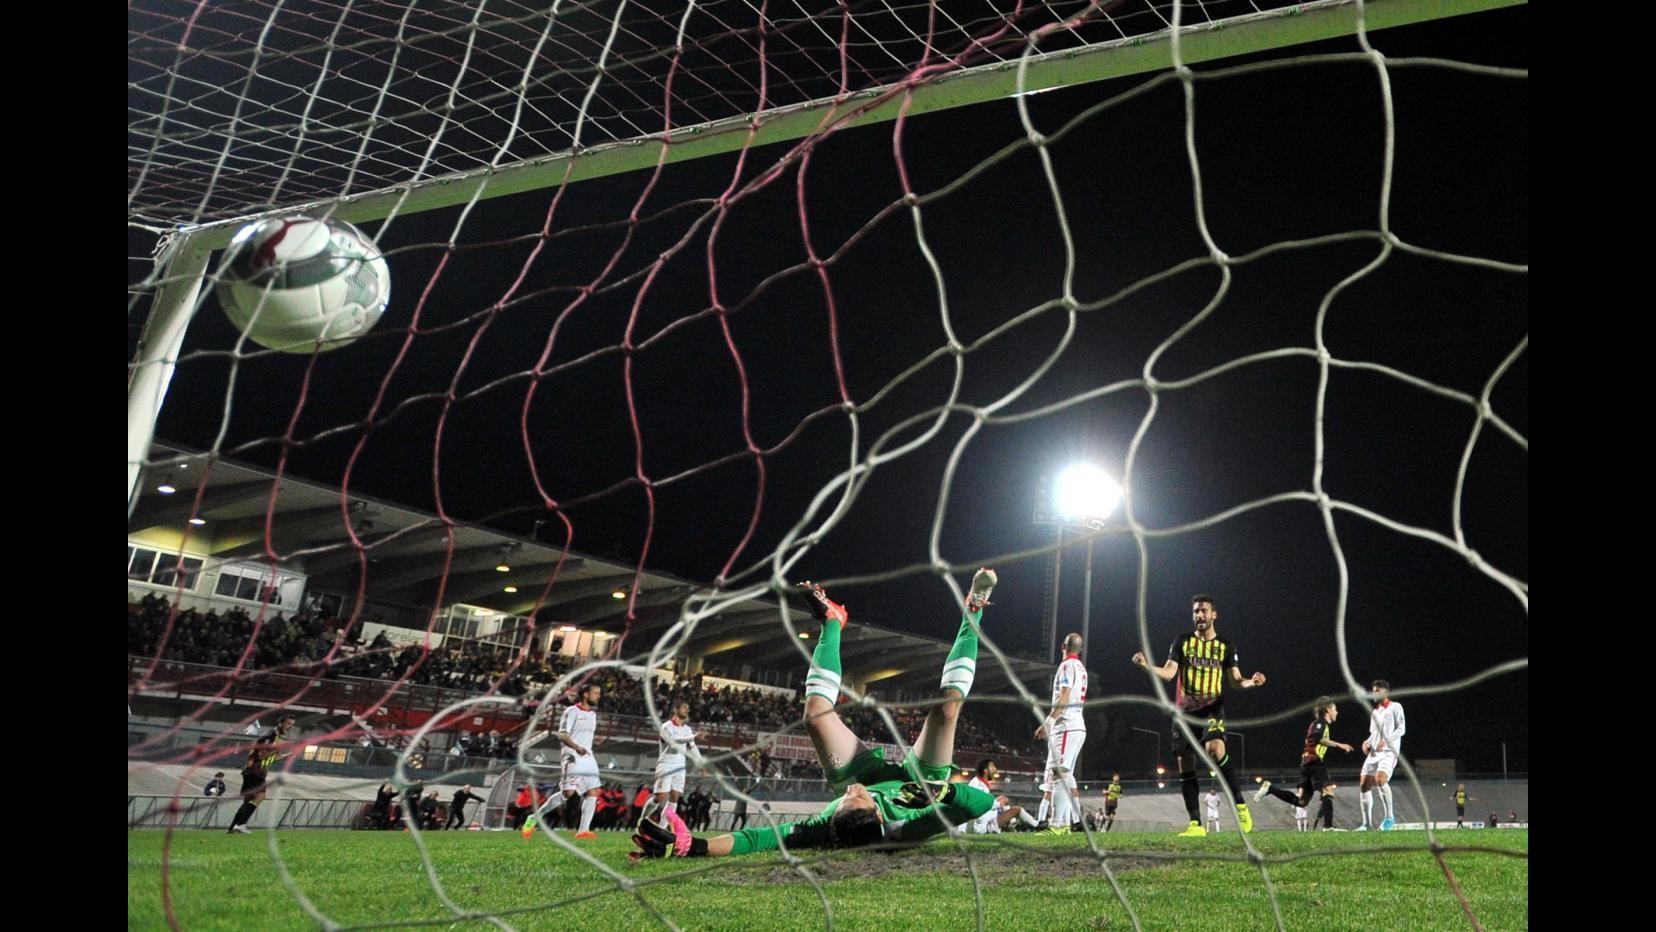 FOTO Lega Pro, Forlì-Bassano 0-2